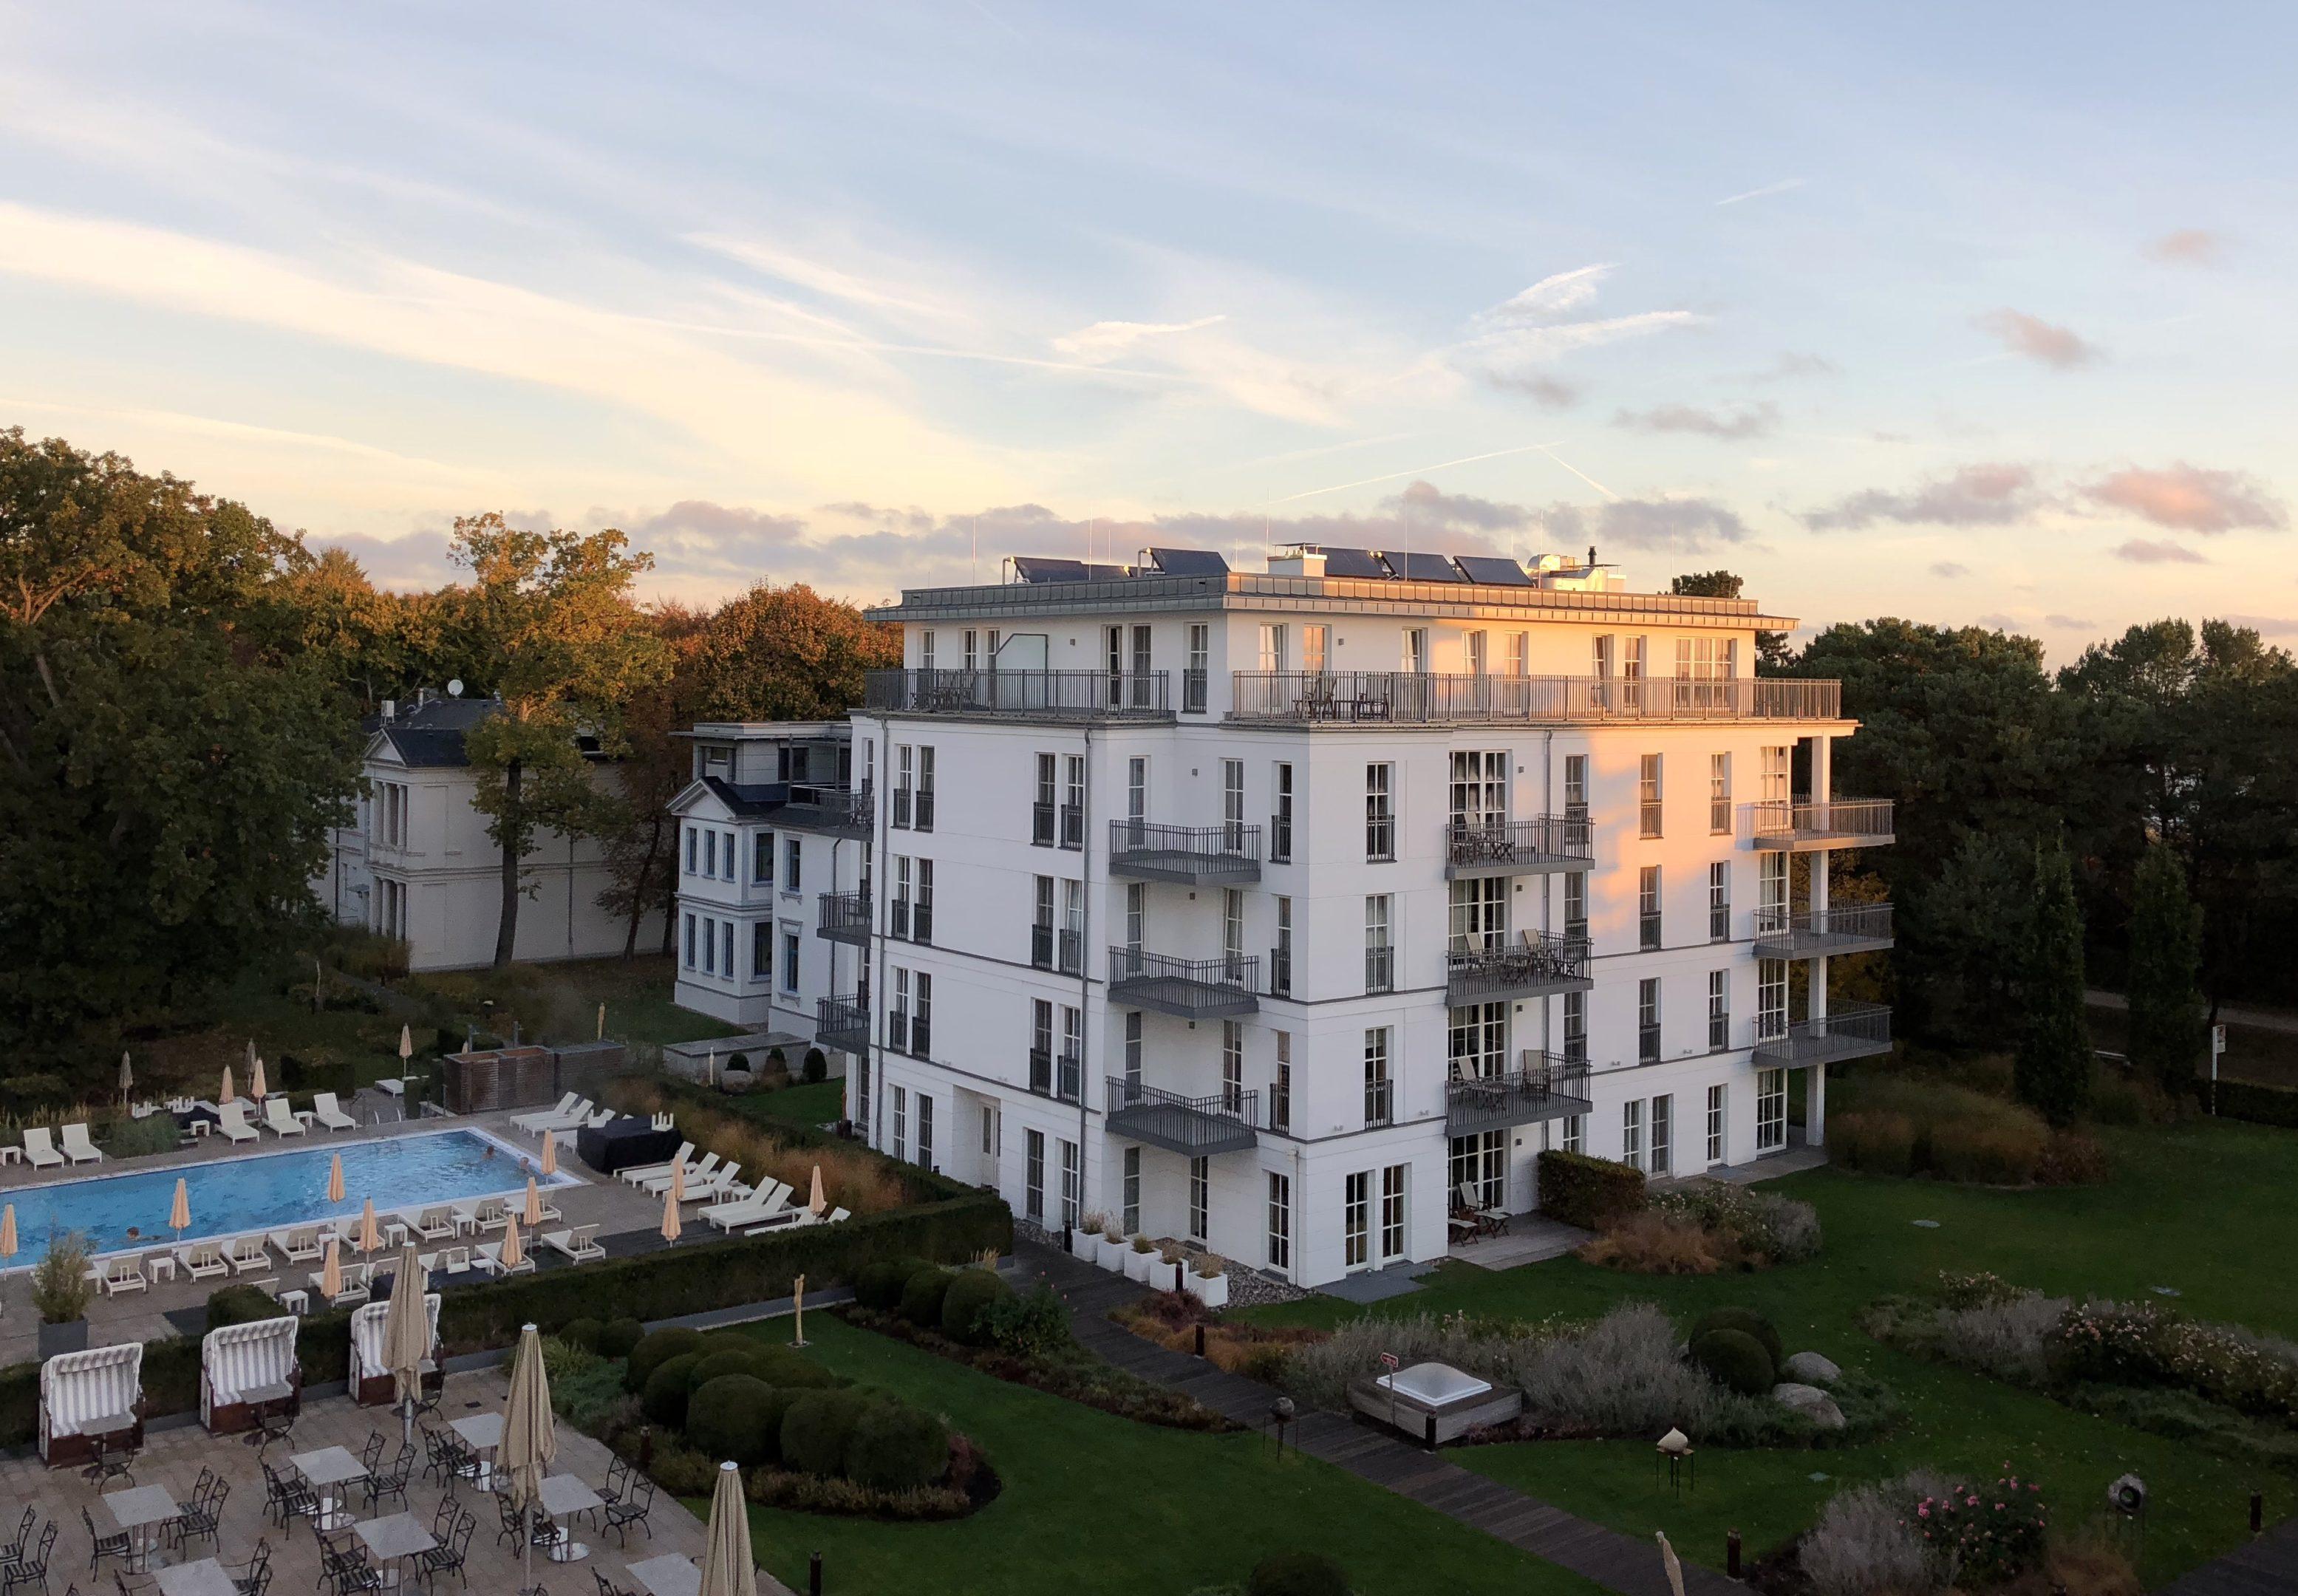 Review – Steigenberger Grandhotel and Spa Heringsdorf